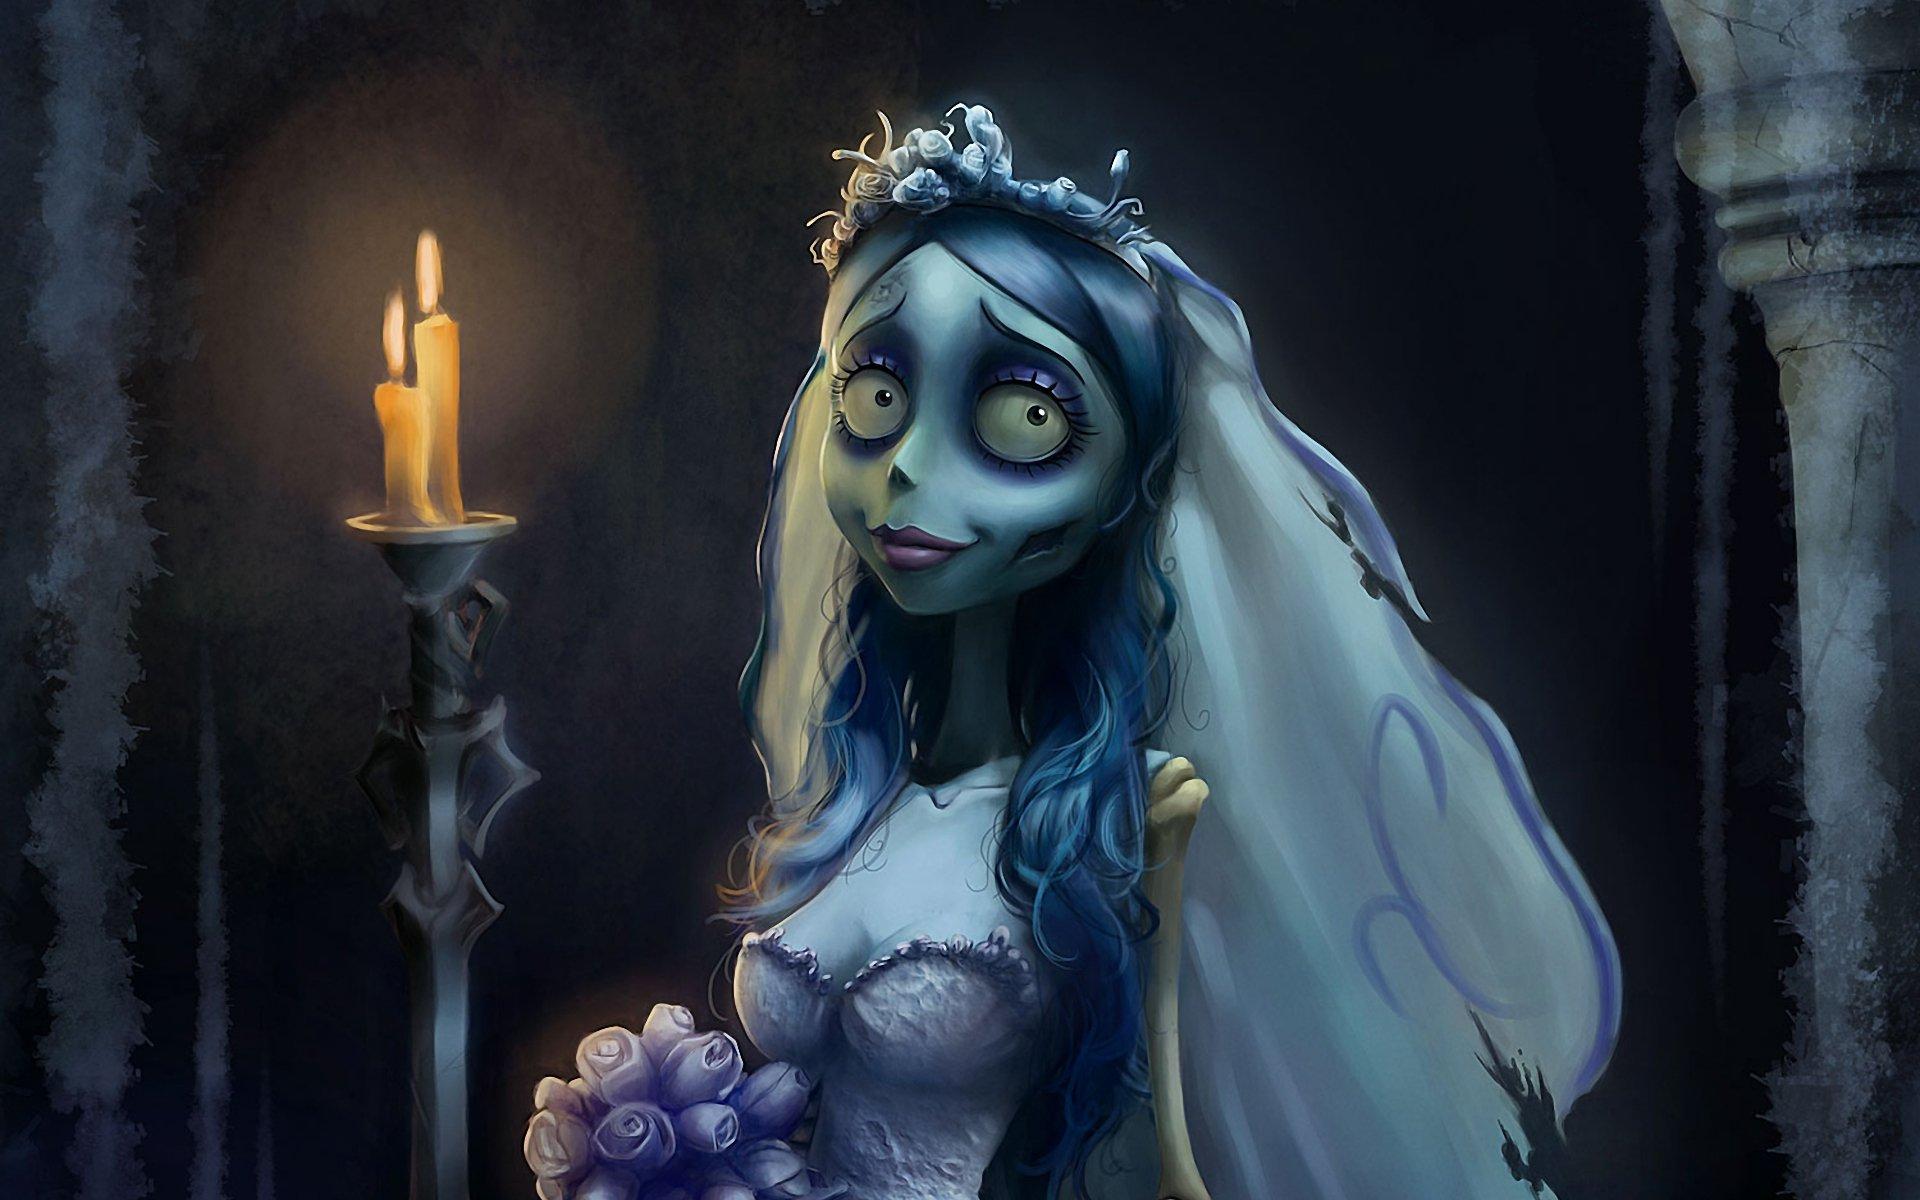 13 Corpse Bride Fondos De Pantalla Hd Fondos De Escritorio